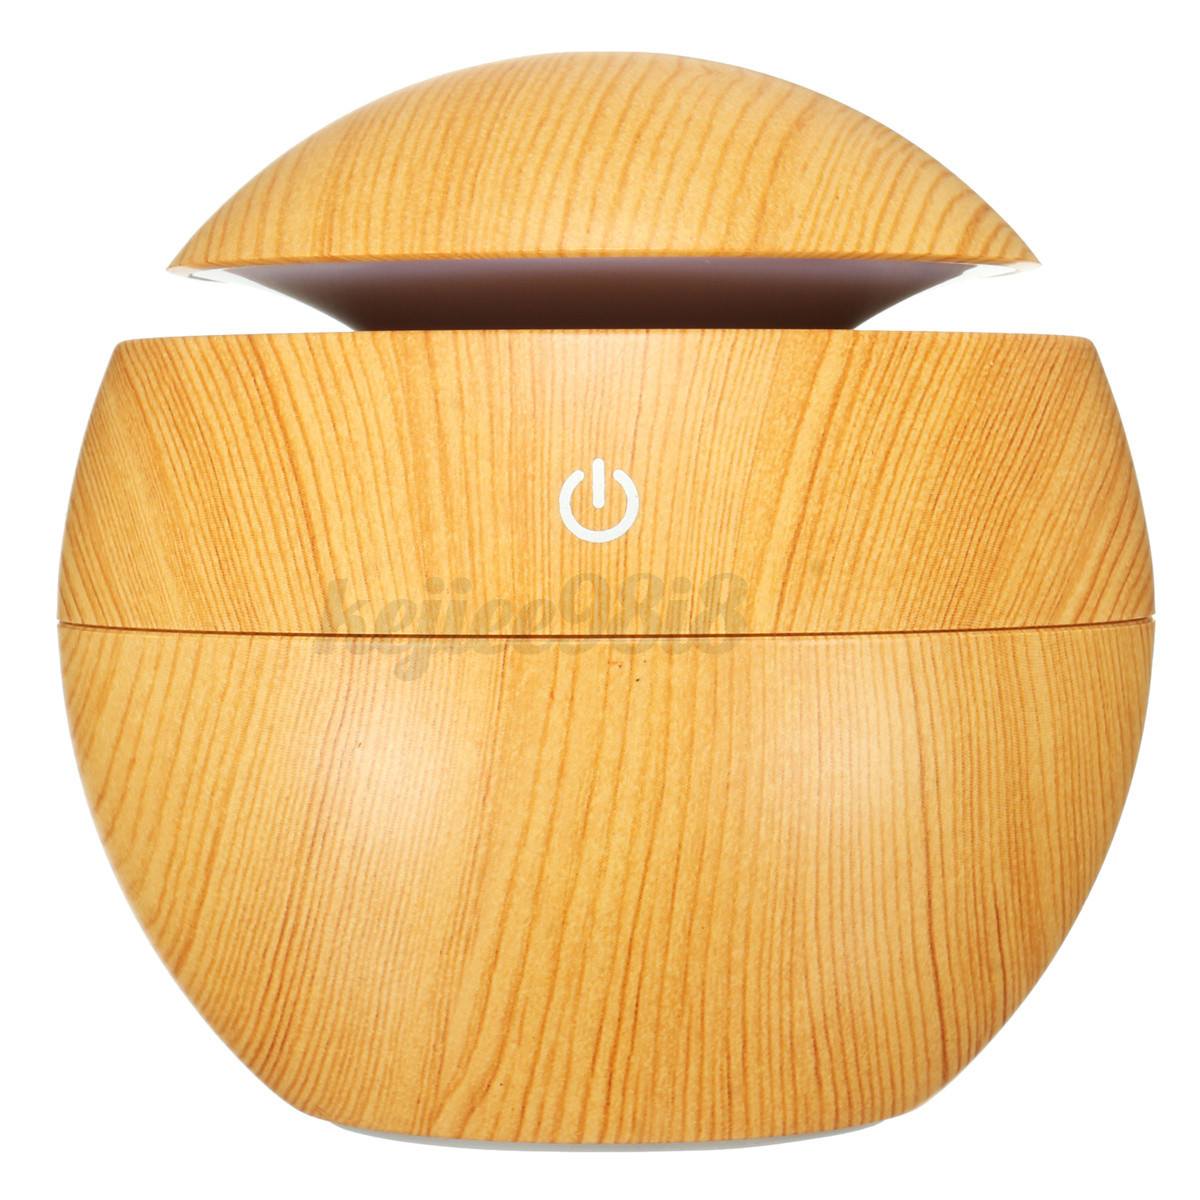 Ultrasonic Diffuser Air Humidifier LED Essential Oil Purifier eBay #BB7A10